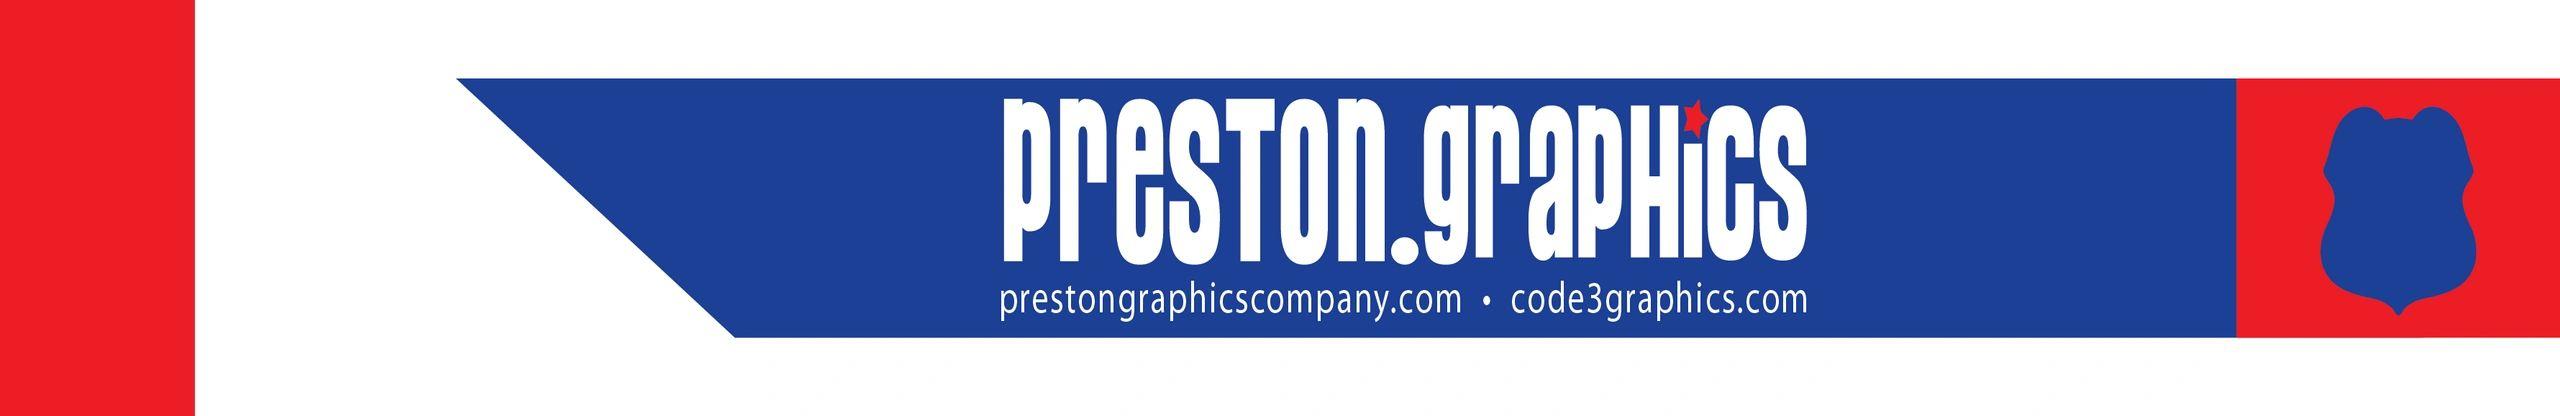 Preston Graphics - Badges, Smith & Warren, Police Badge